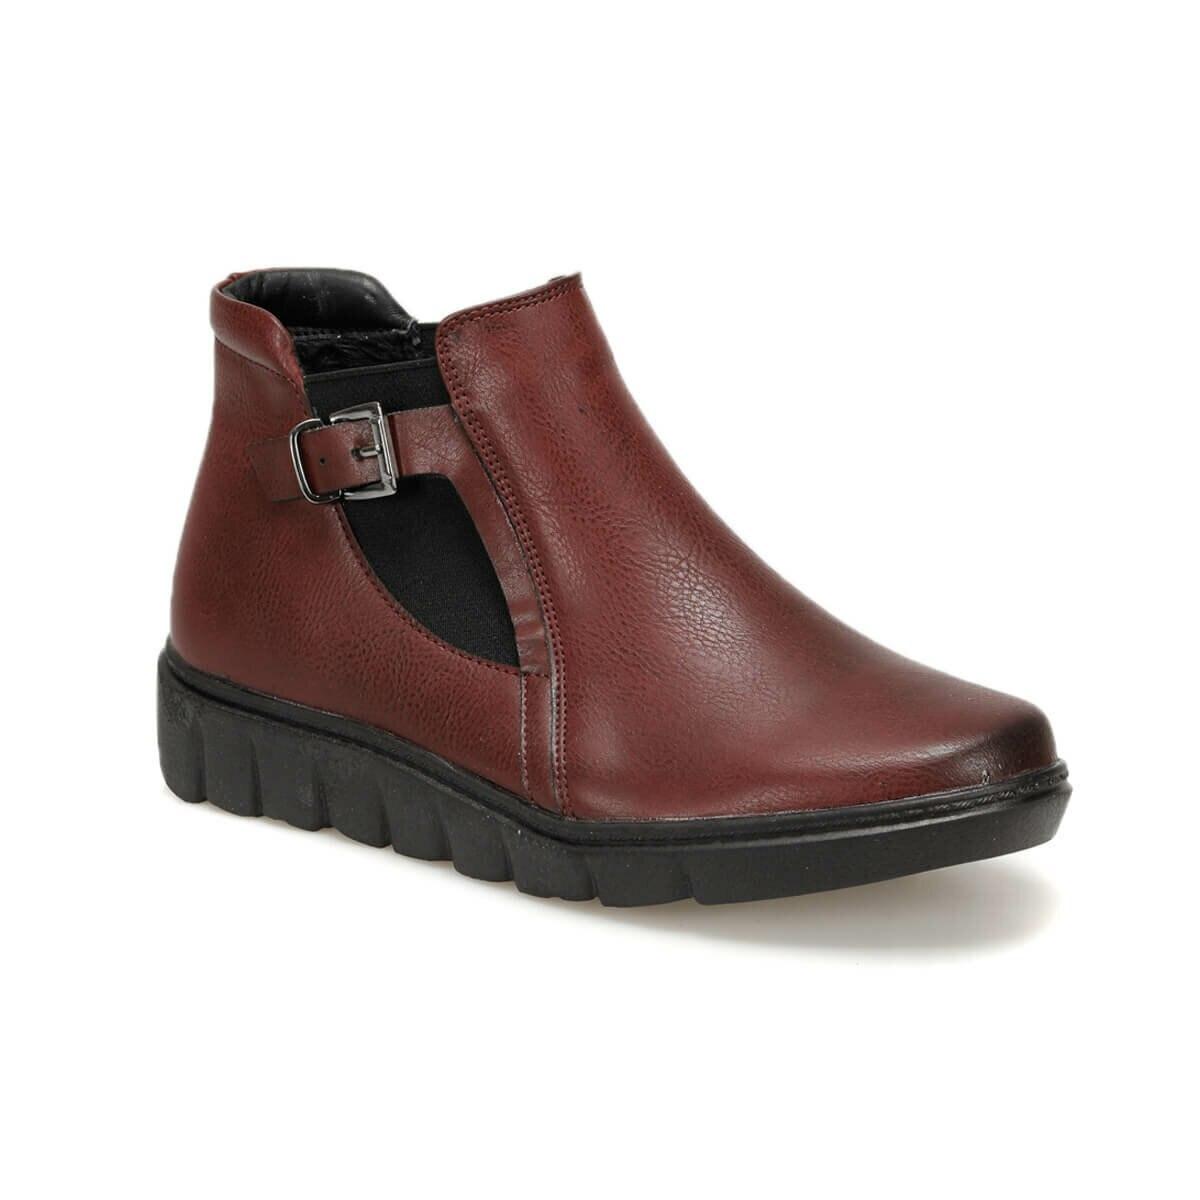 FLO TRV8221 Burgundy Women 'S Boots Polaris